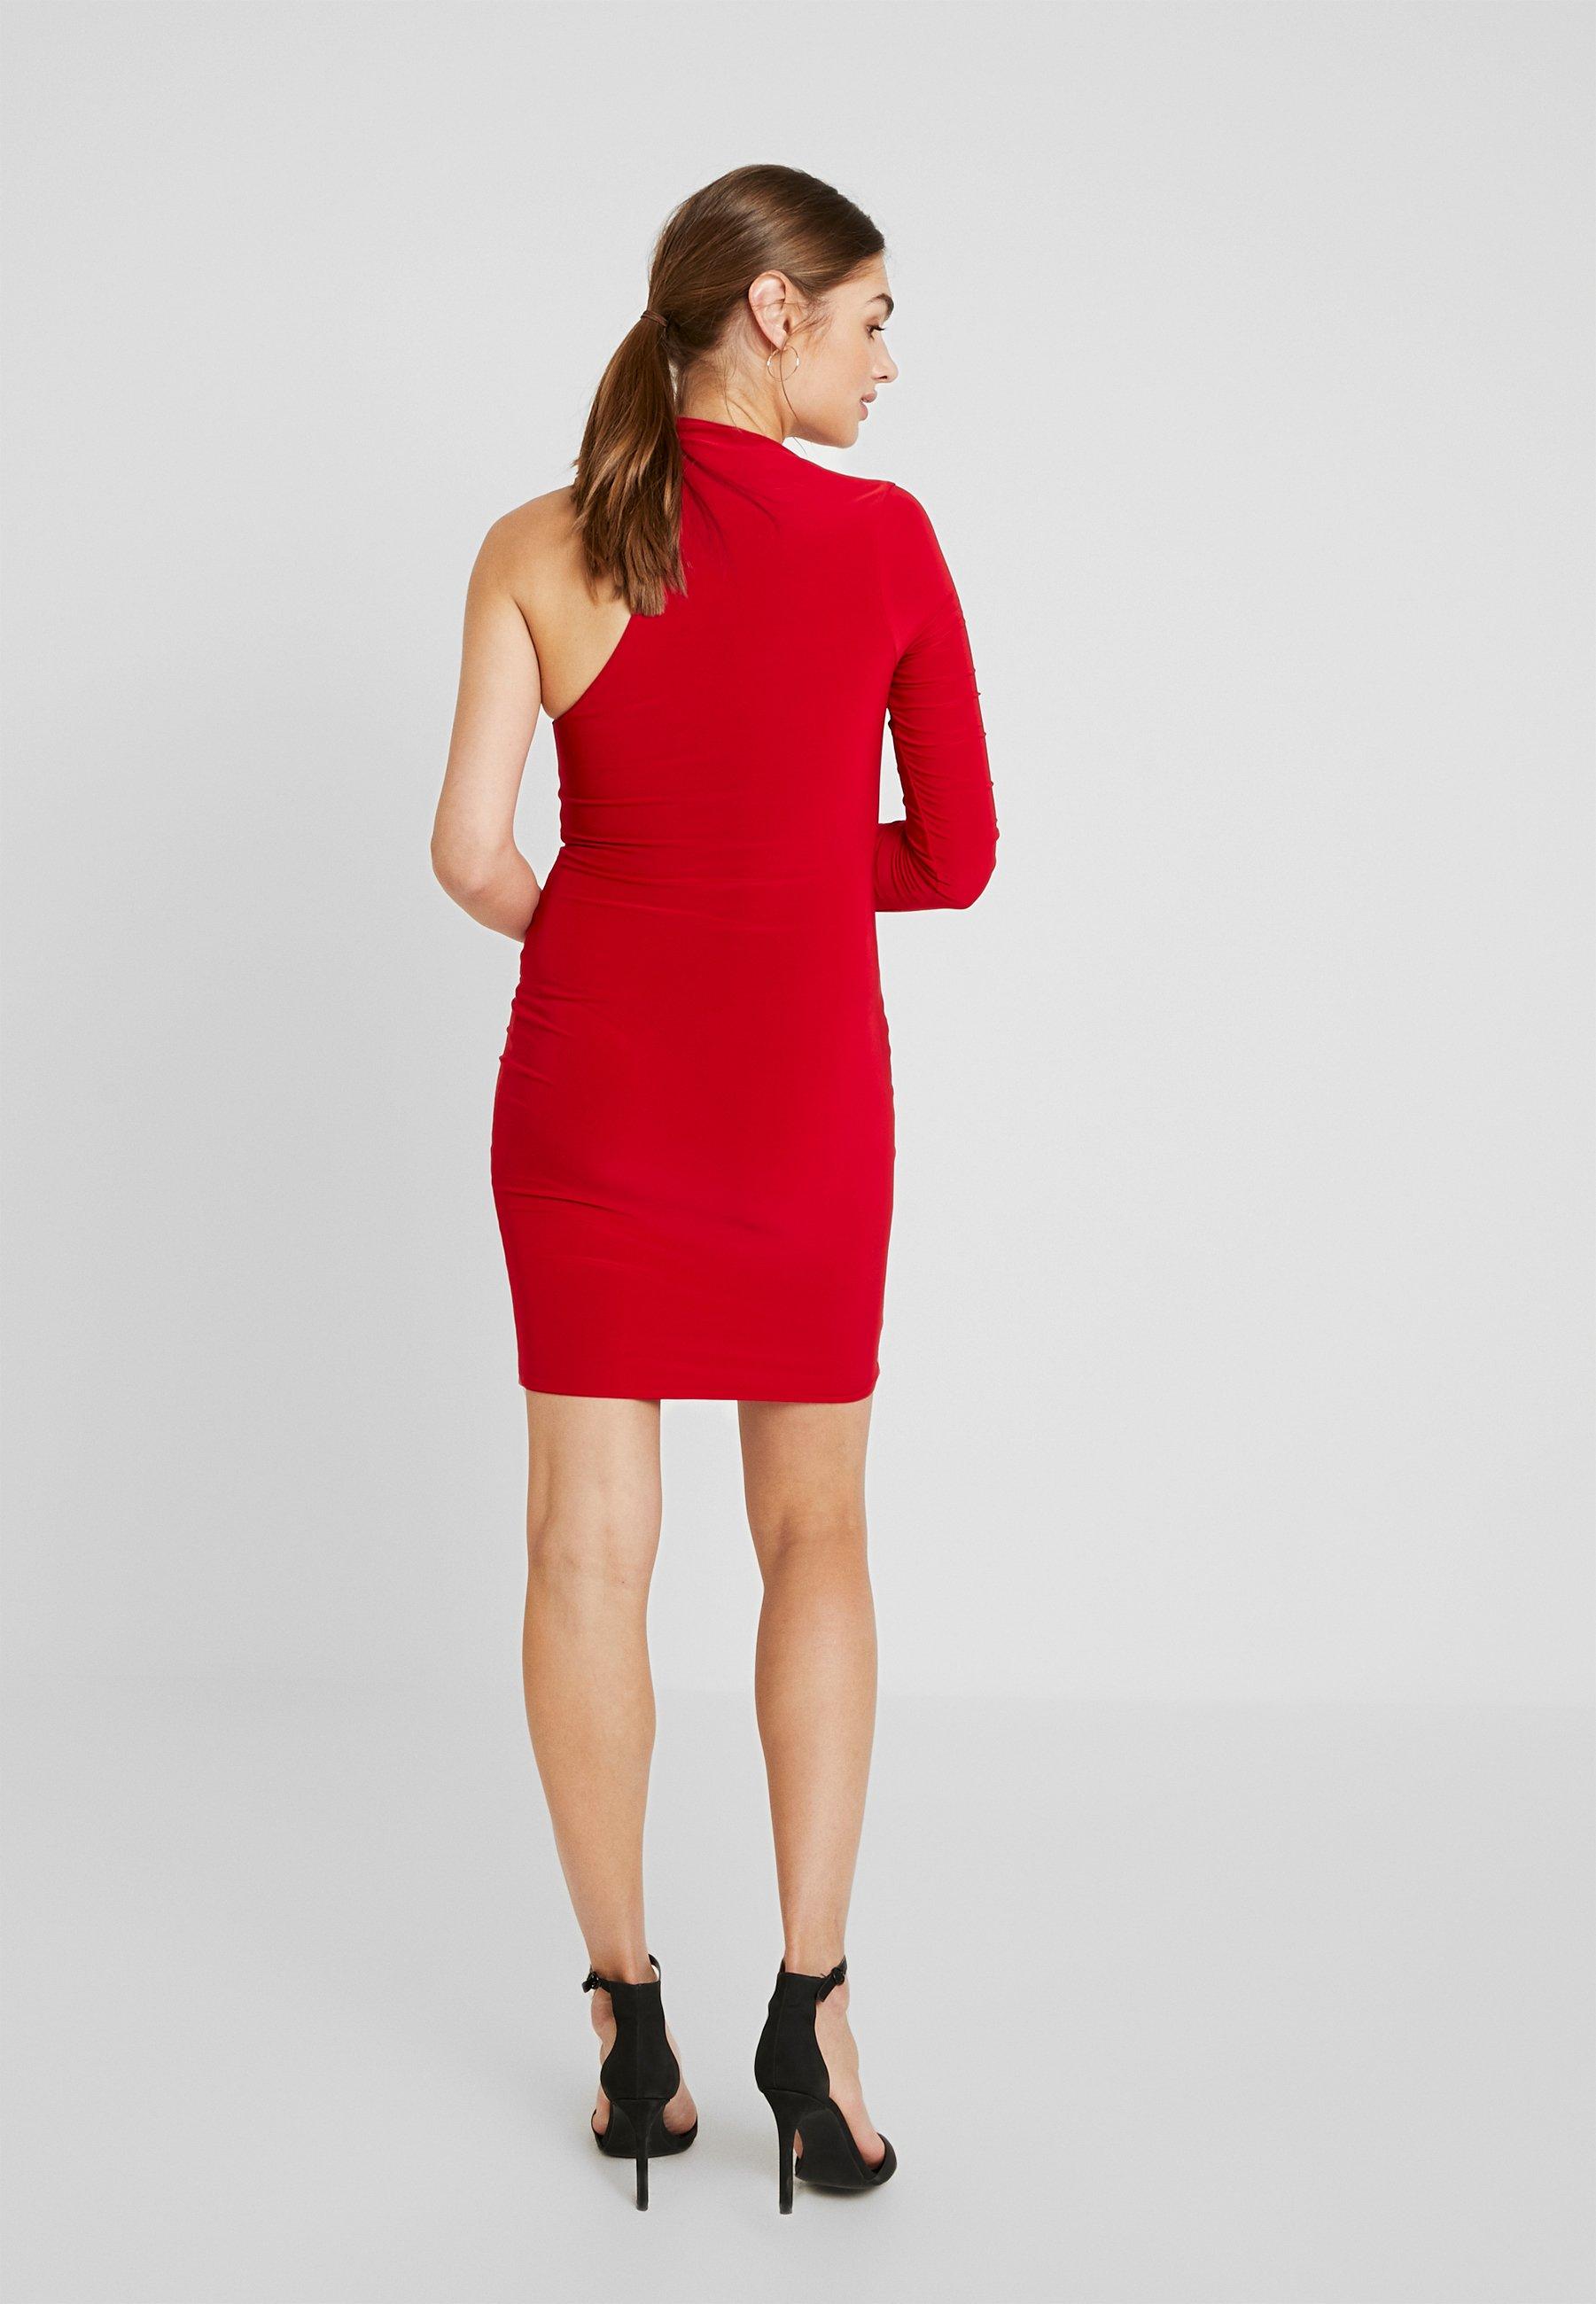 Jersey L Shoulder Red London En Club One DressRobe Mini fyb7g6